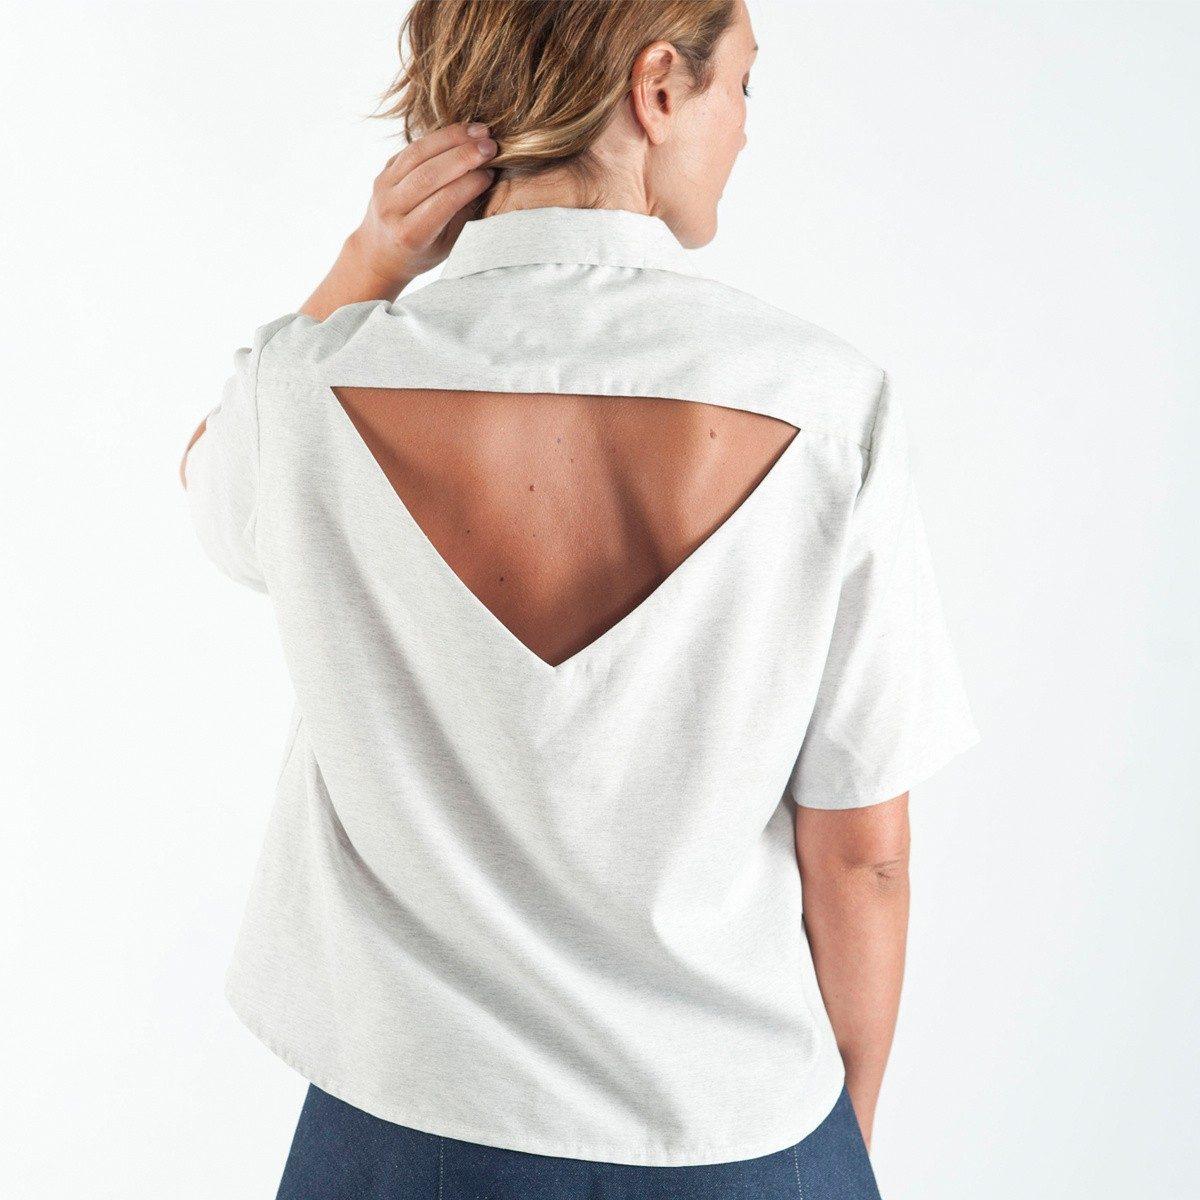 WYLDE - chemise charlotte